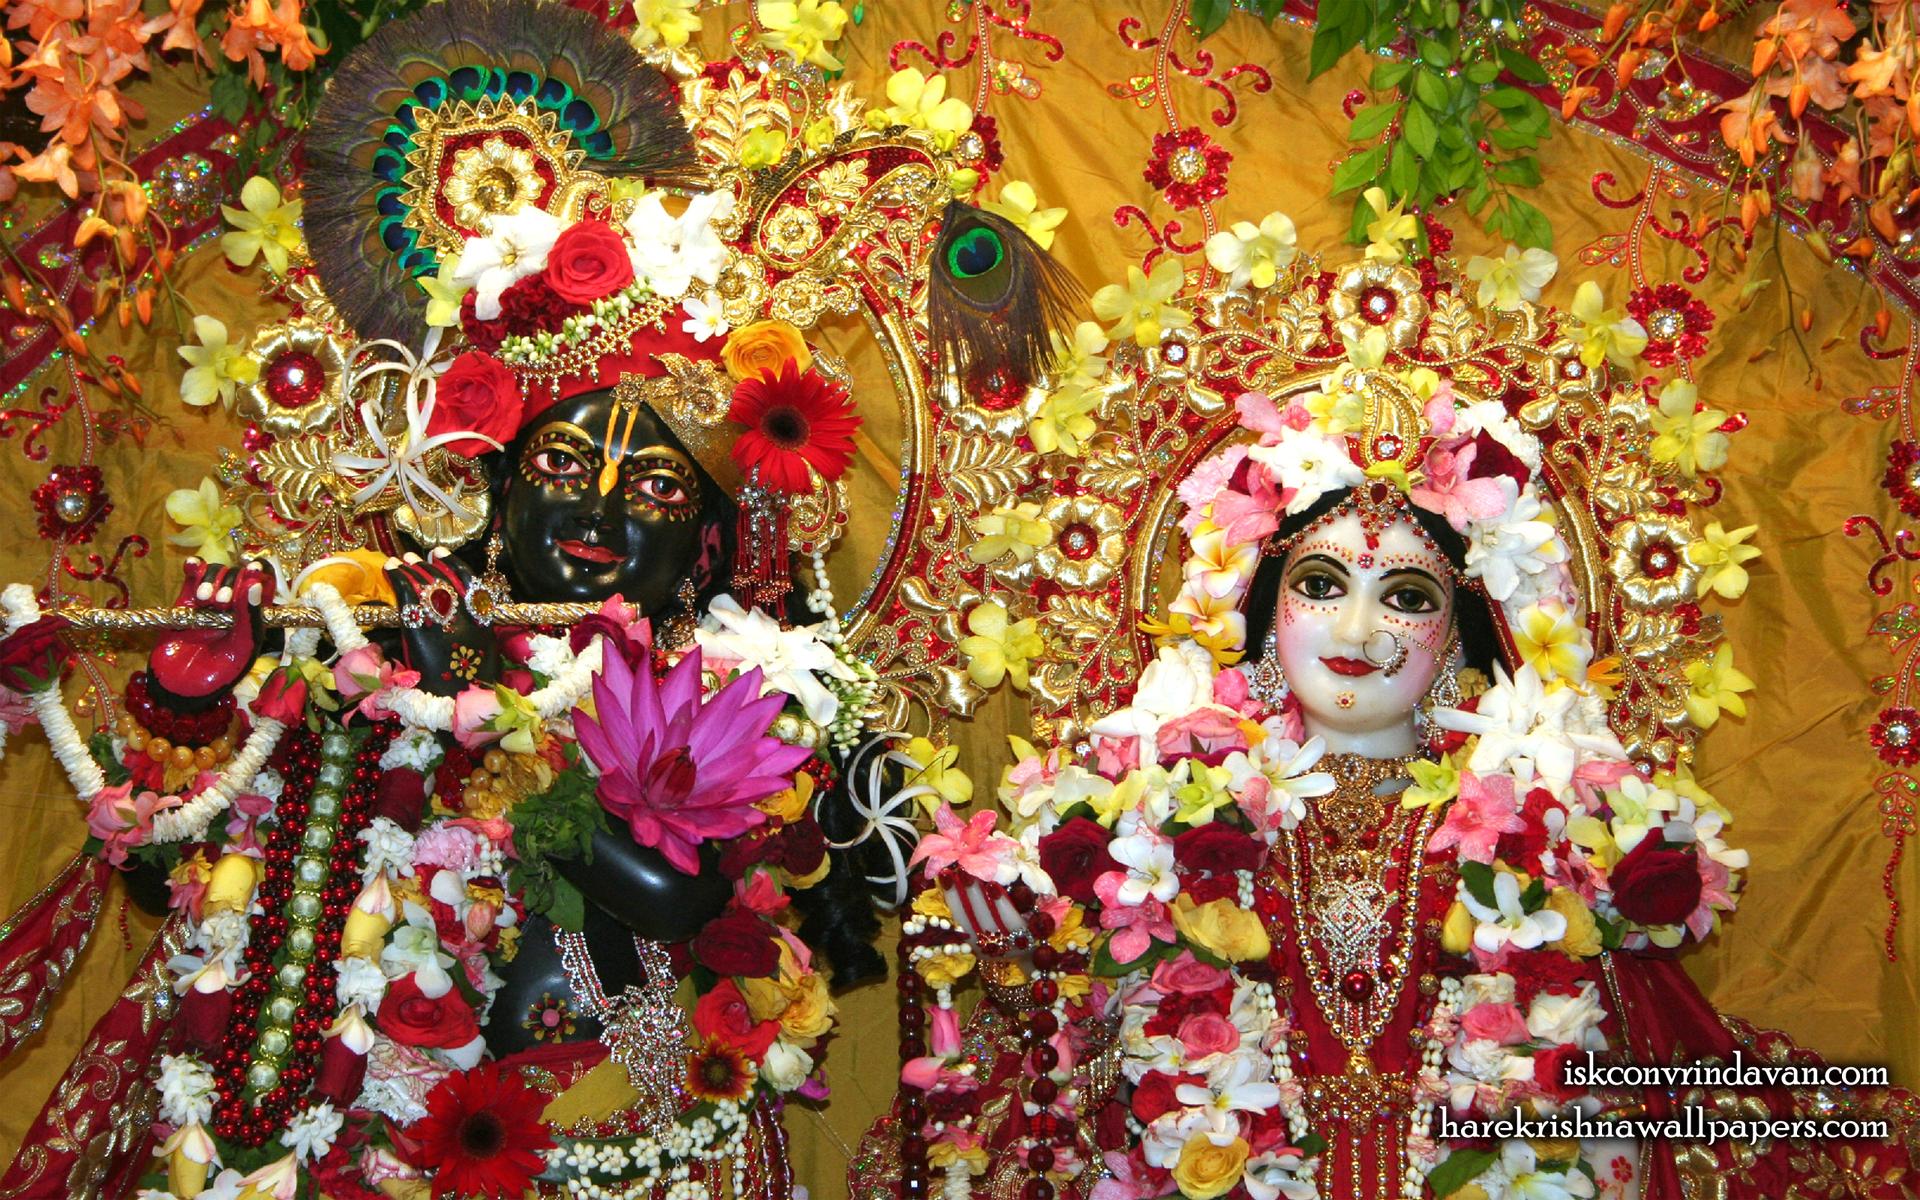 Sri Sri Radha Shyamsundar Close up Wallpaper (004) Size 1920x1200 Download